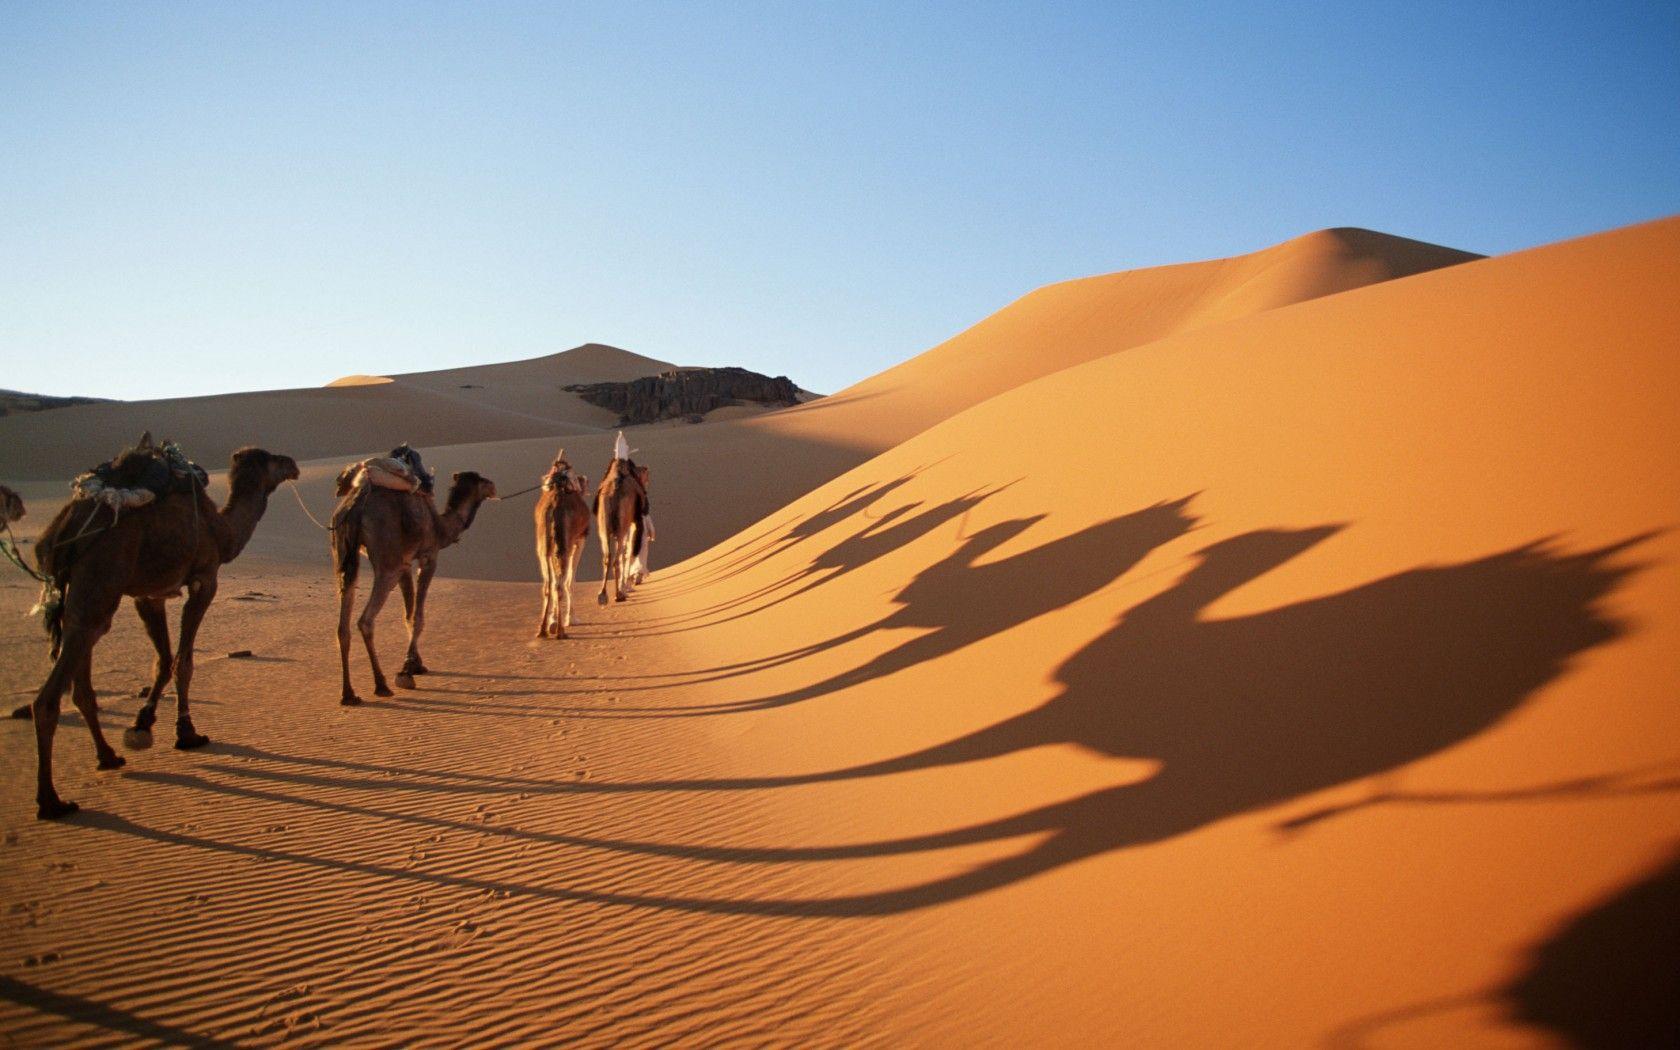 desert ecosystem images